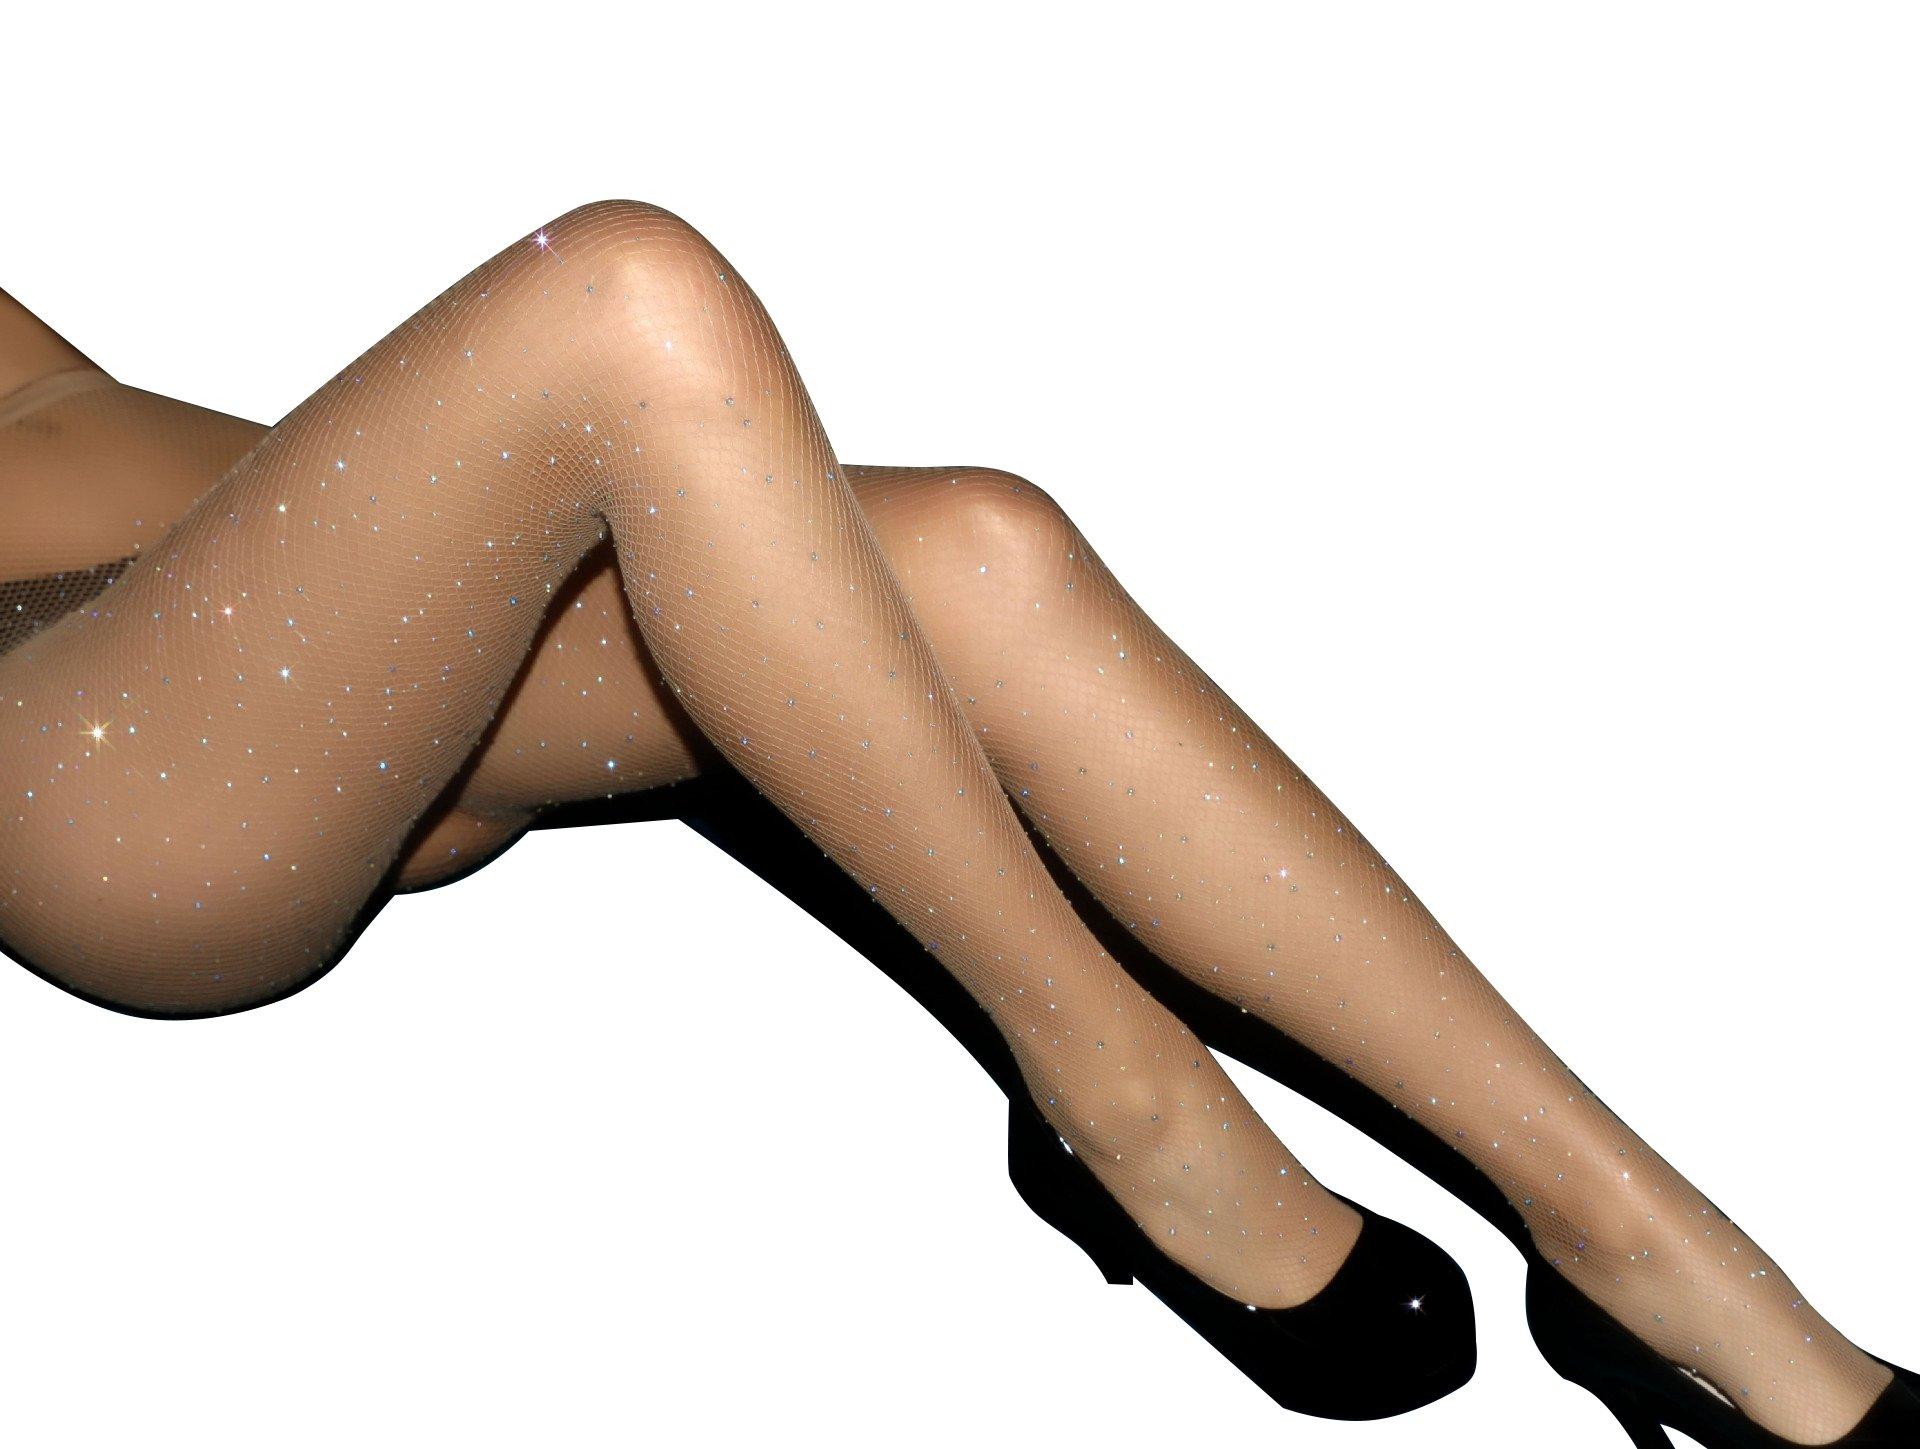 Sparkle Rhinestone Fishnet Stockings Women's High Waist Fishnet Tights Pantyhose